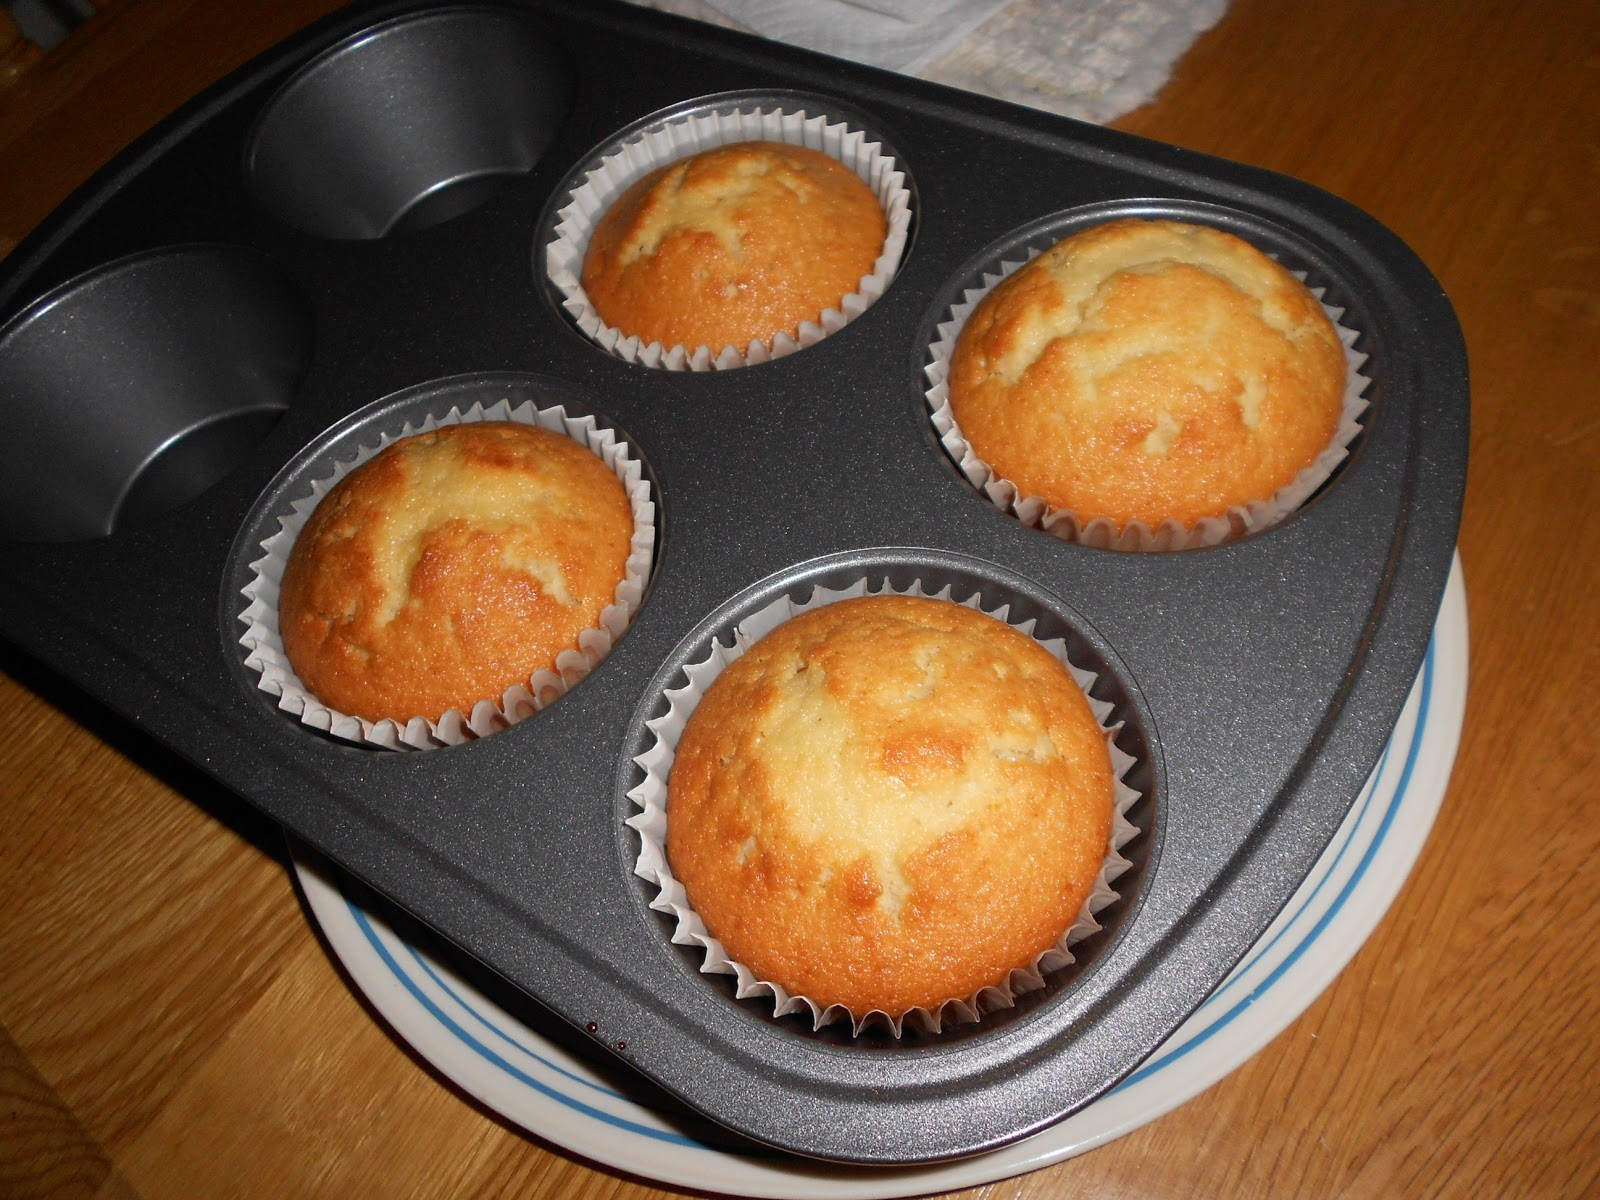 Пироженки в домашних условиях быстро и легко